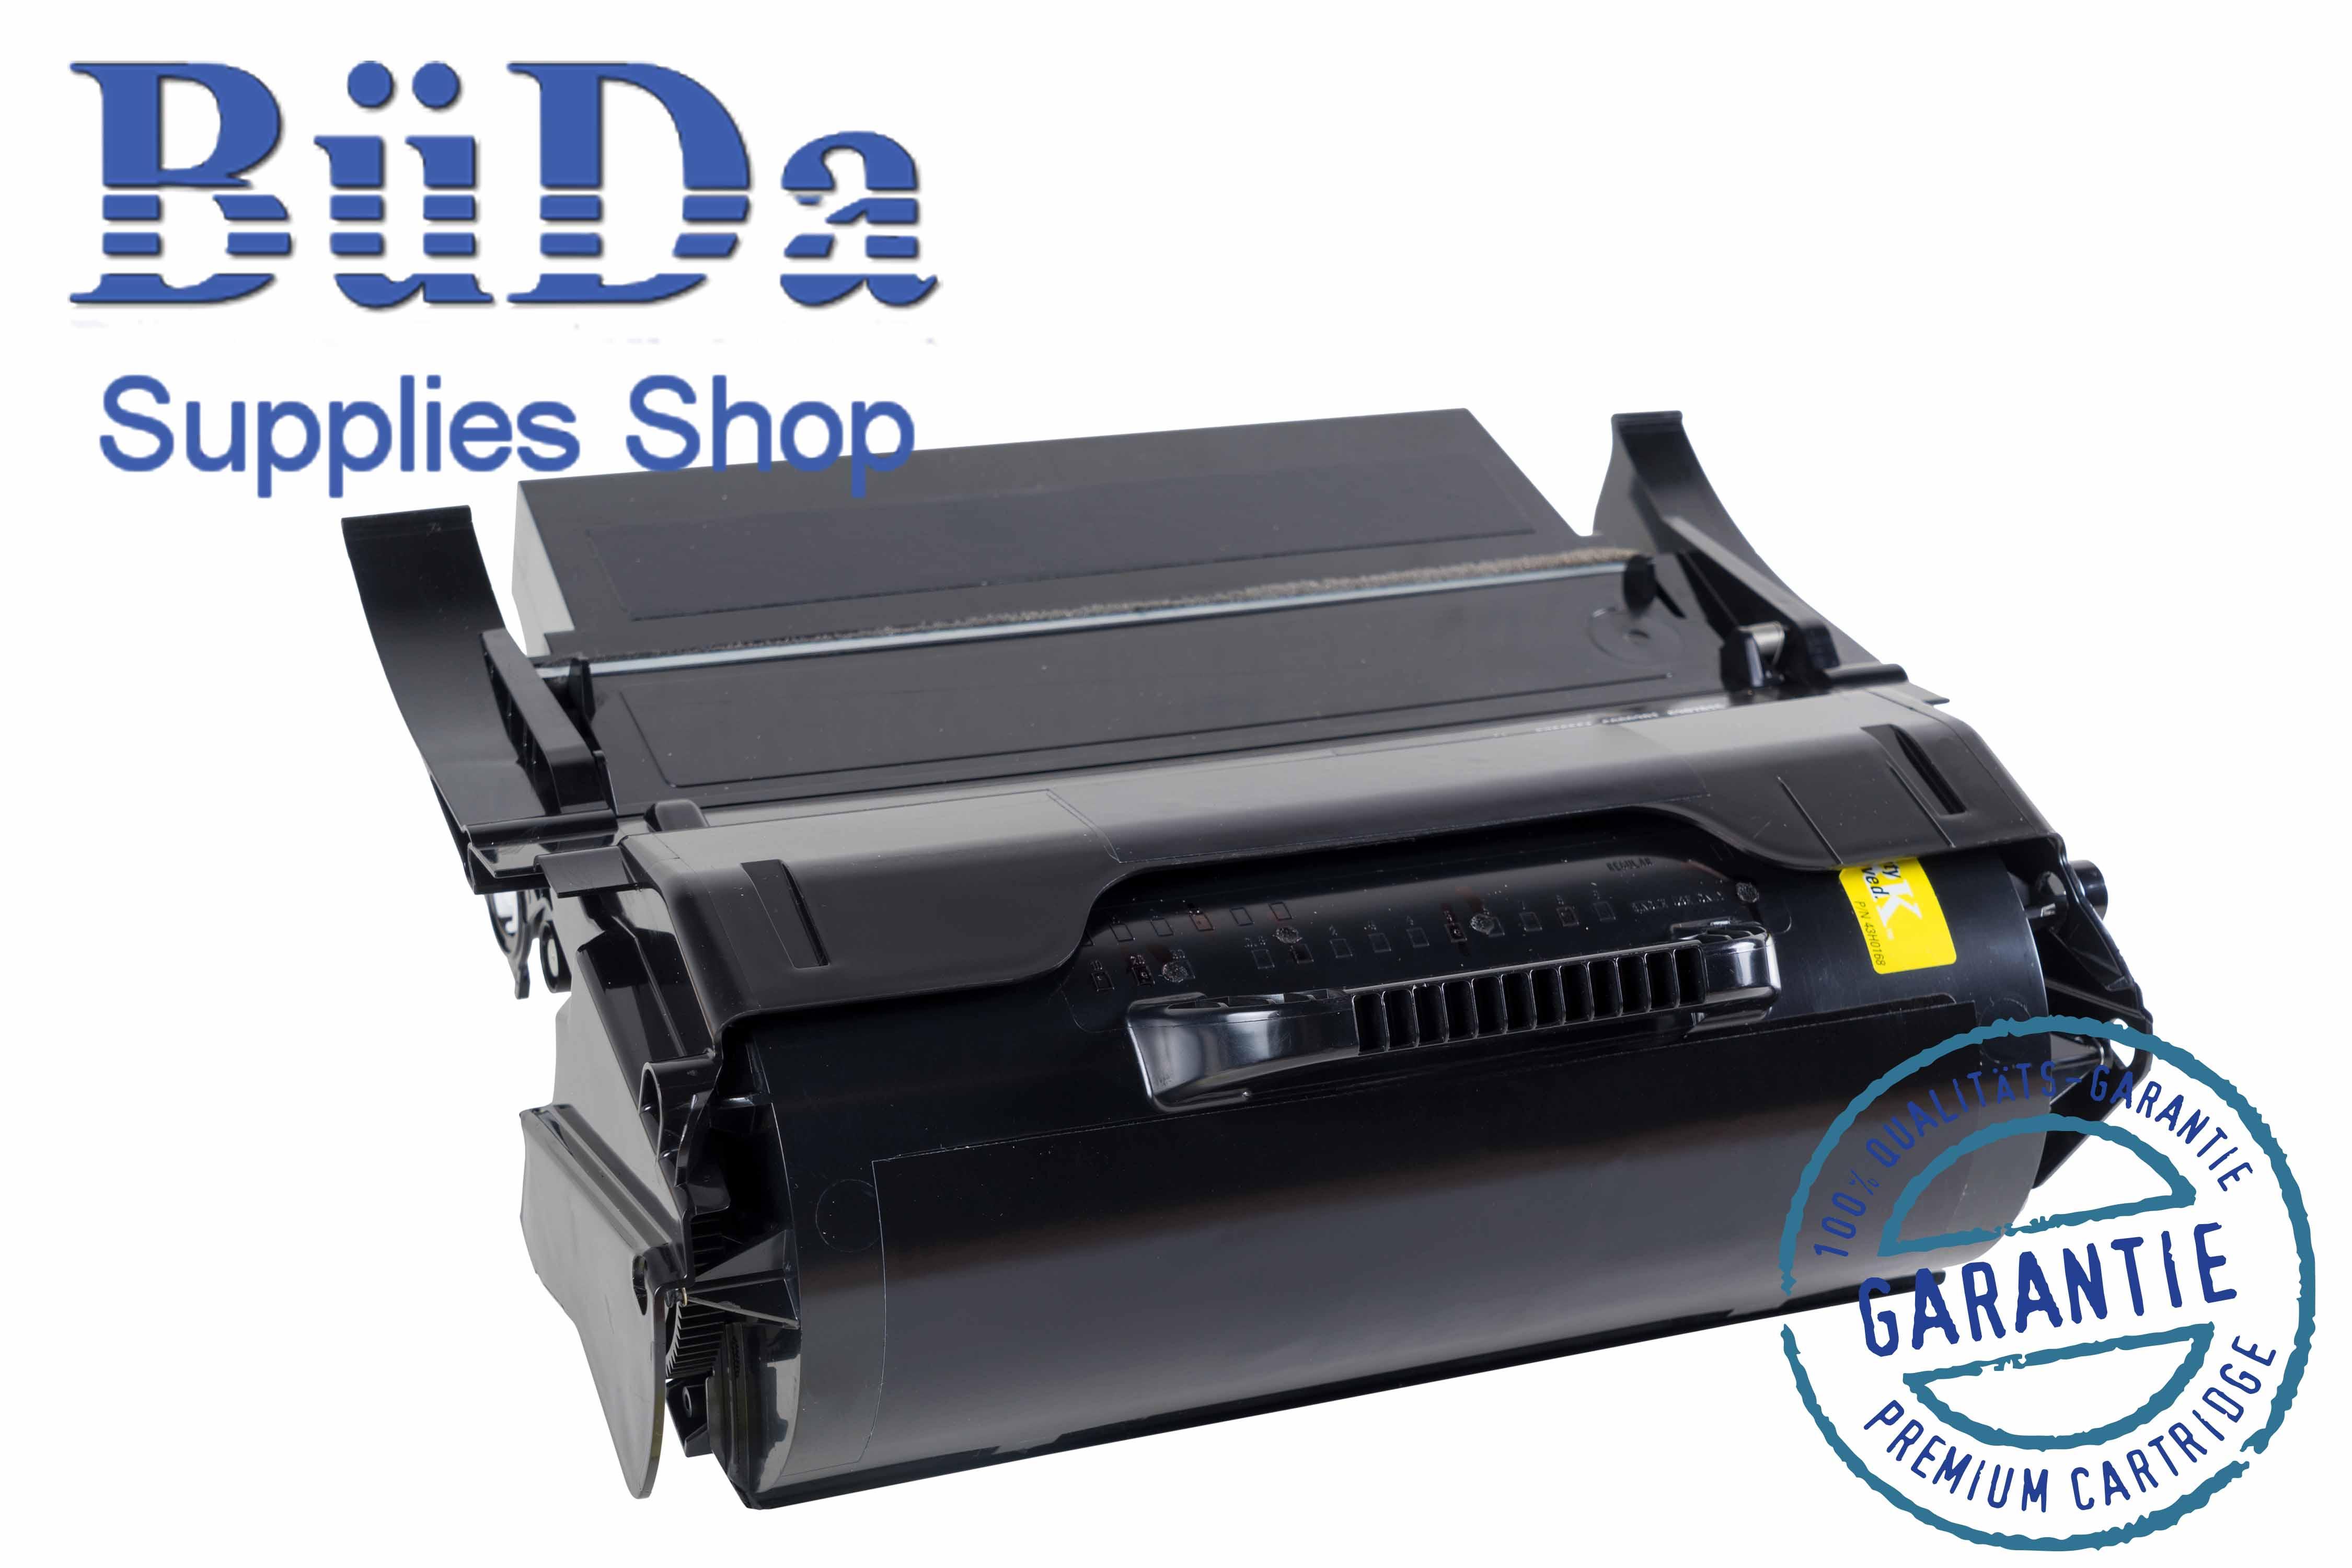 Toner-Modul komp. zu Dell 5350 black 30000 Seiten